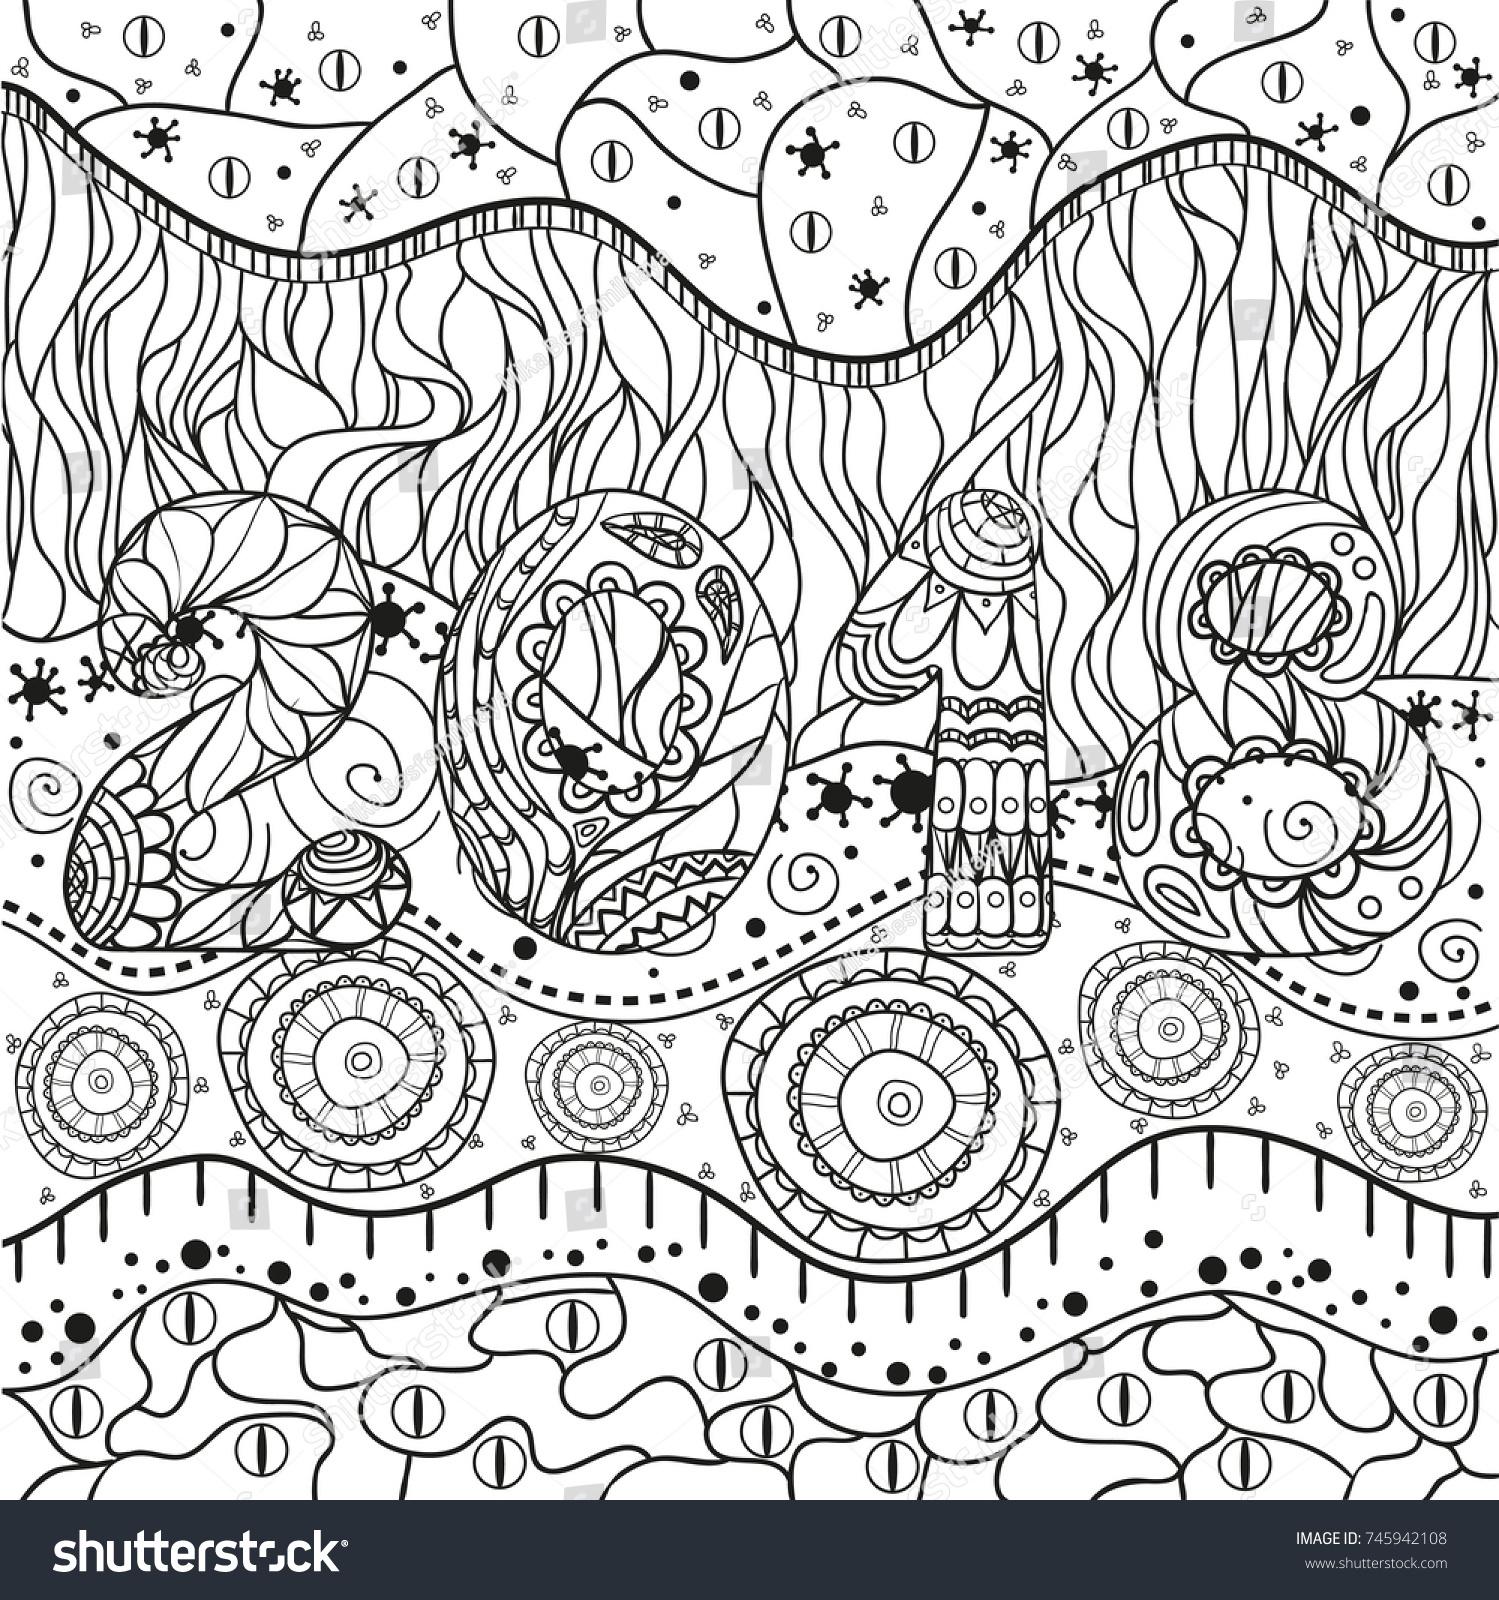 2018 Happy New Year Hand Drawn Stock Illustration - Royalty Free ...